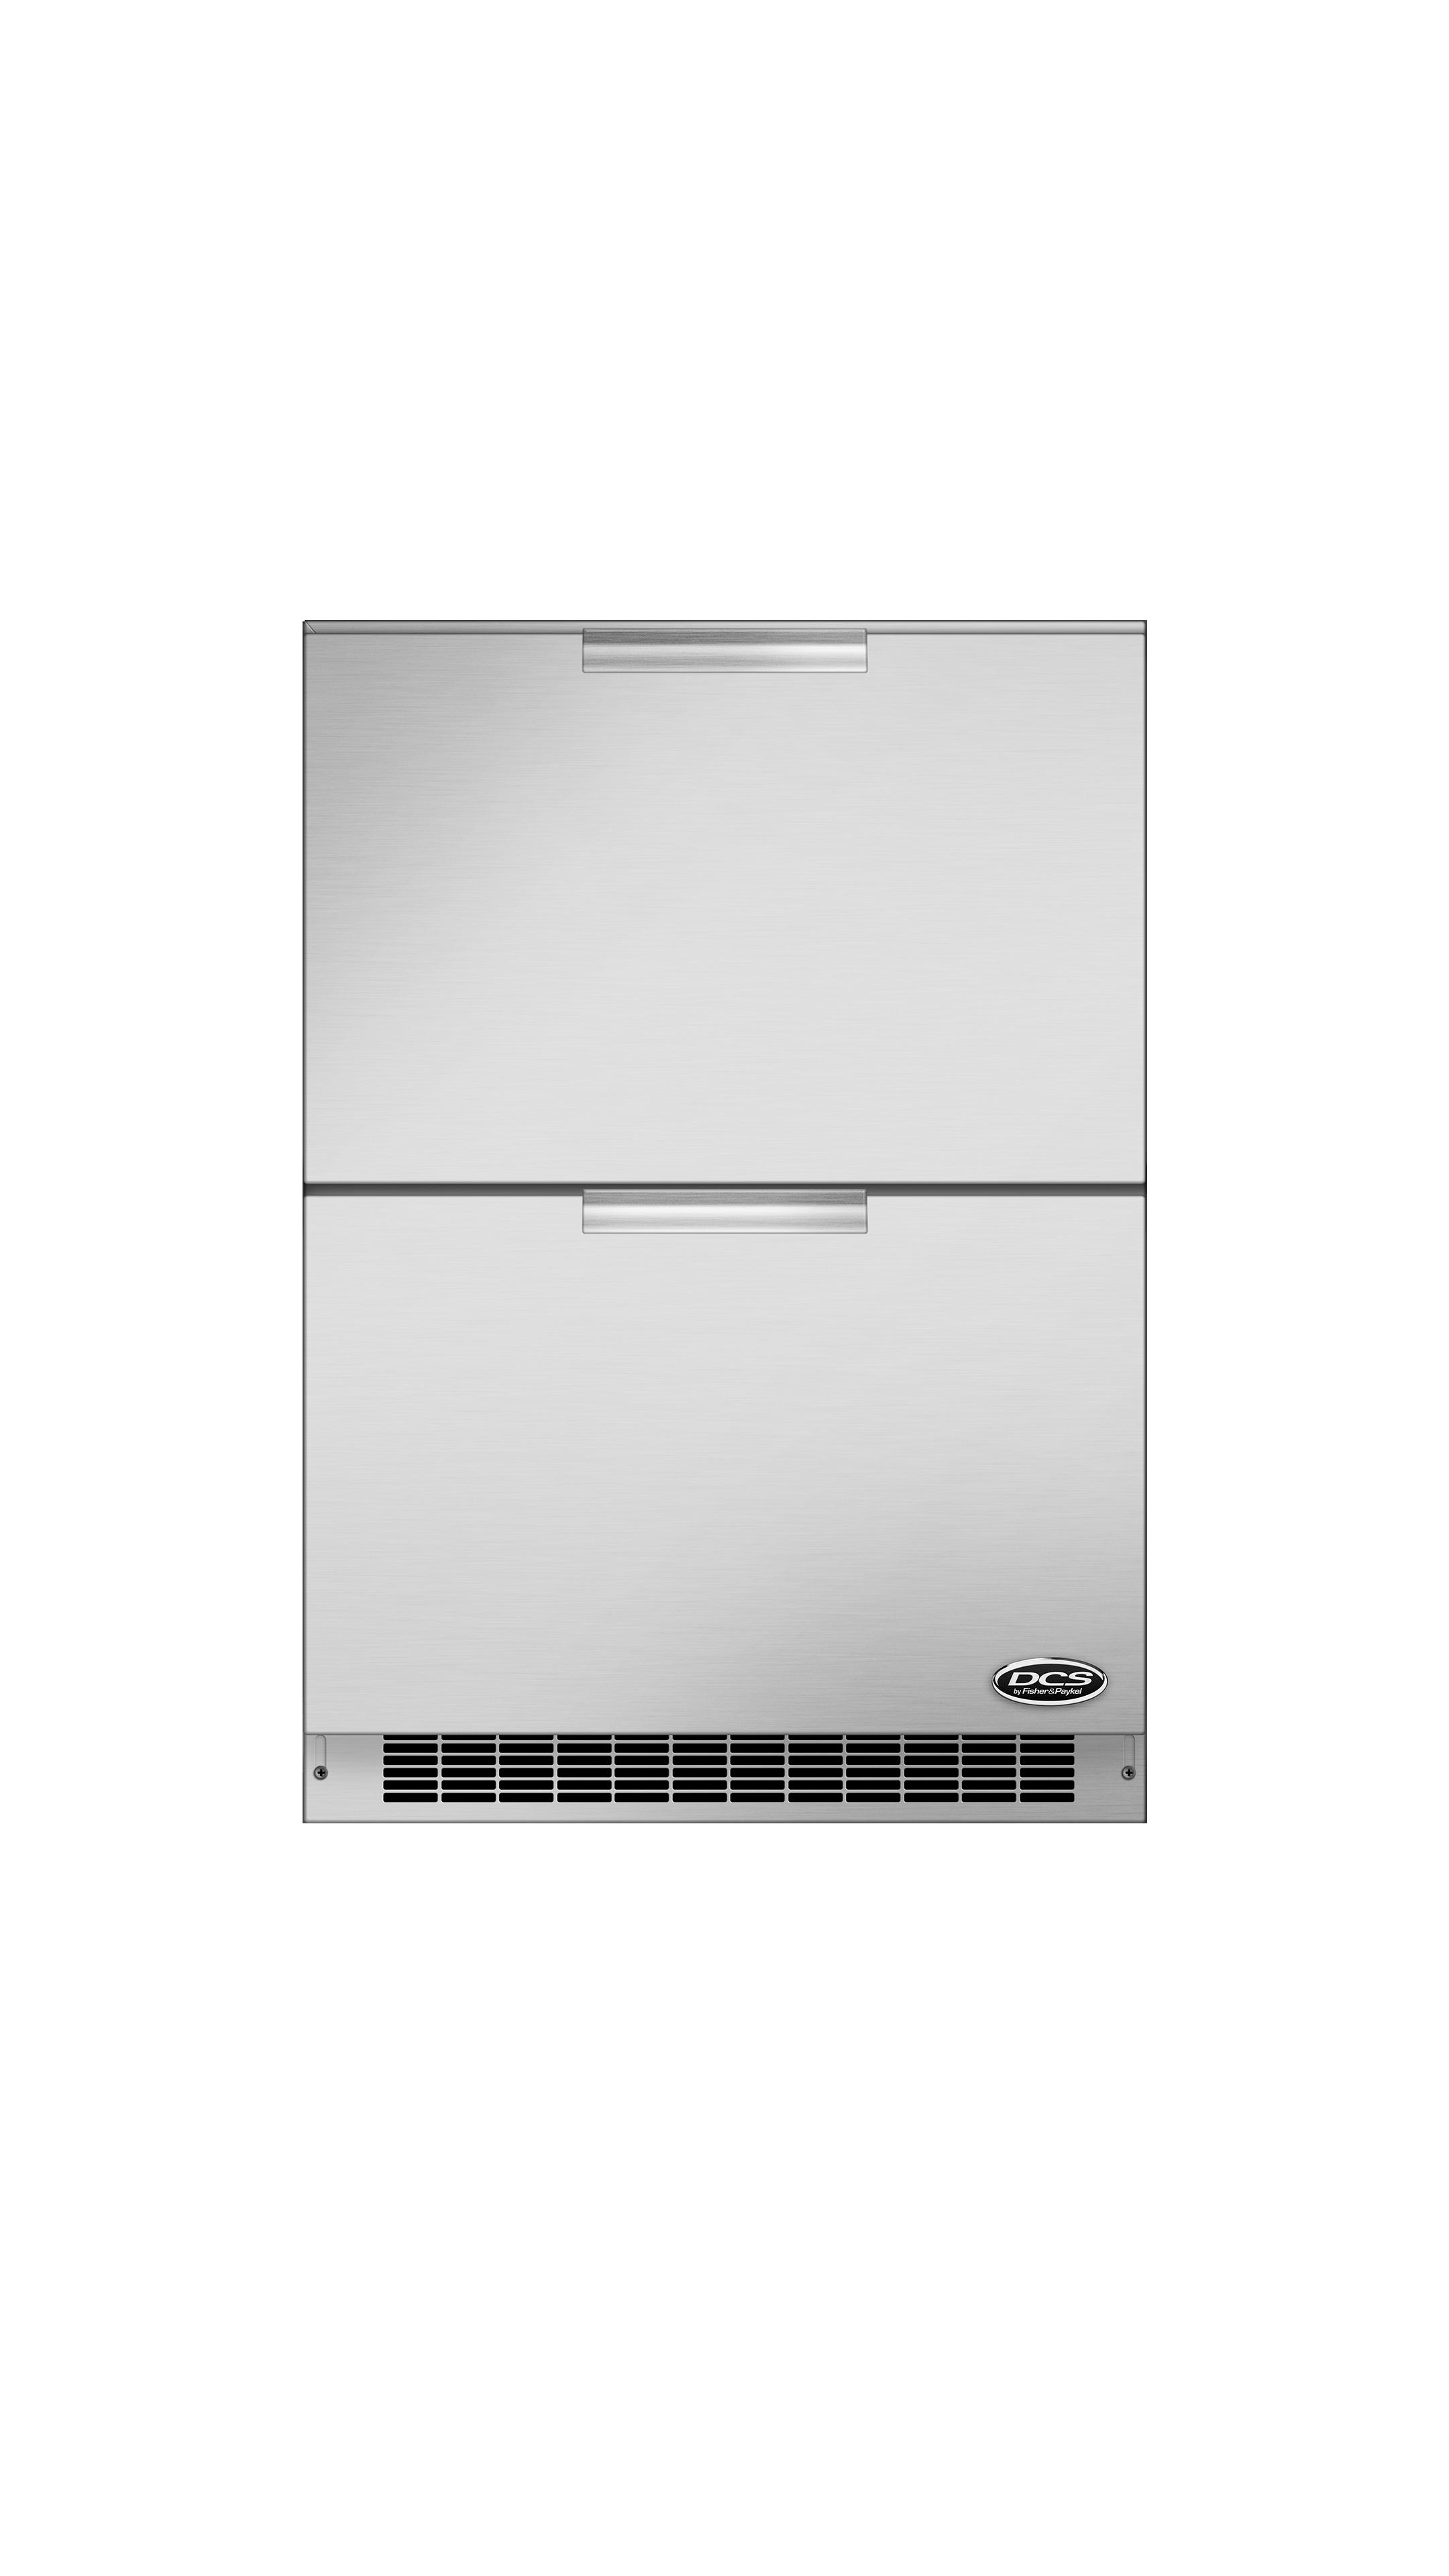 "Model: RF24DE3 | DCS 24"" Outdoor Refrigerator Drawers"